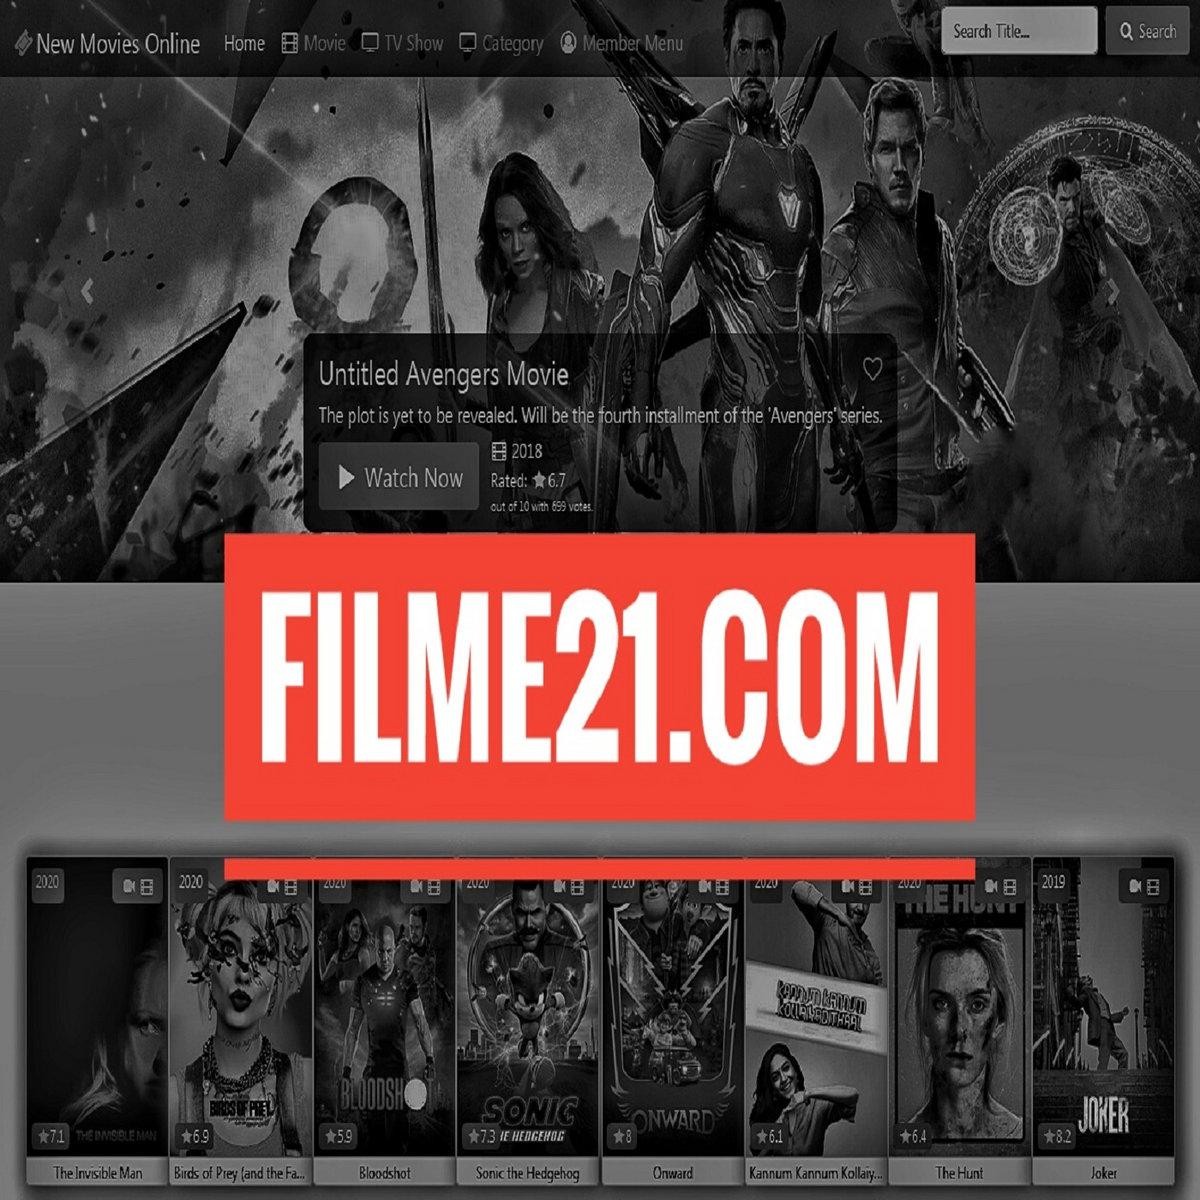 Halloween 2020 Blu Ray Onlin 123Movies.Watch Halloween Kills (2020) Bluray Movies Online